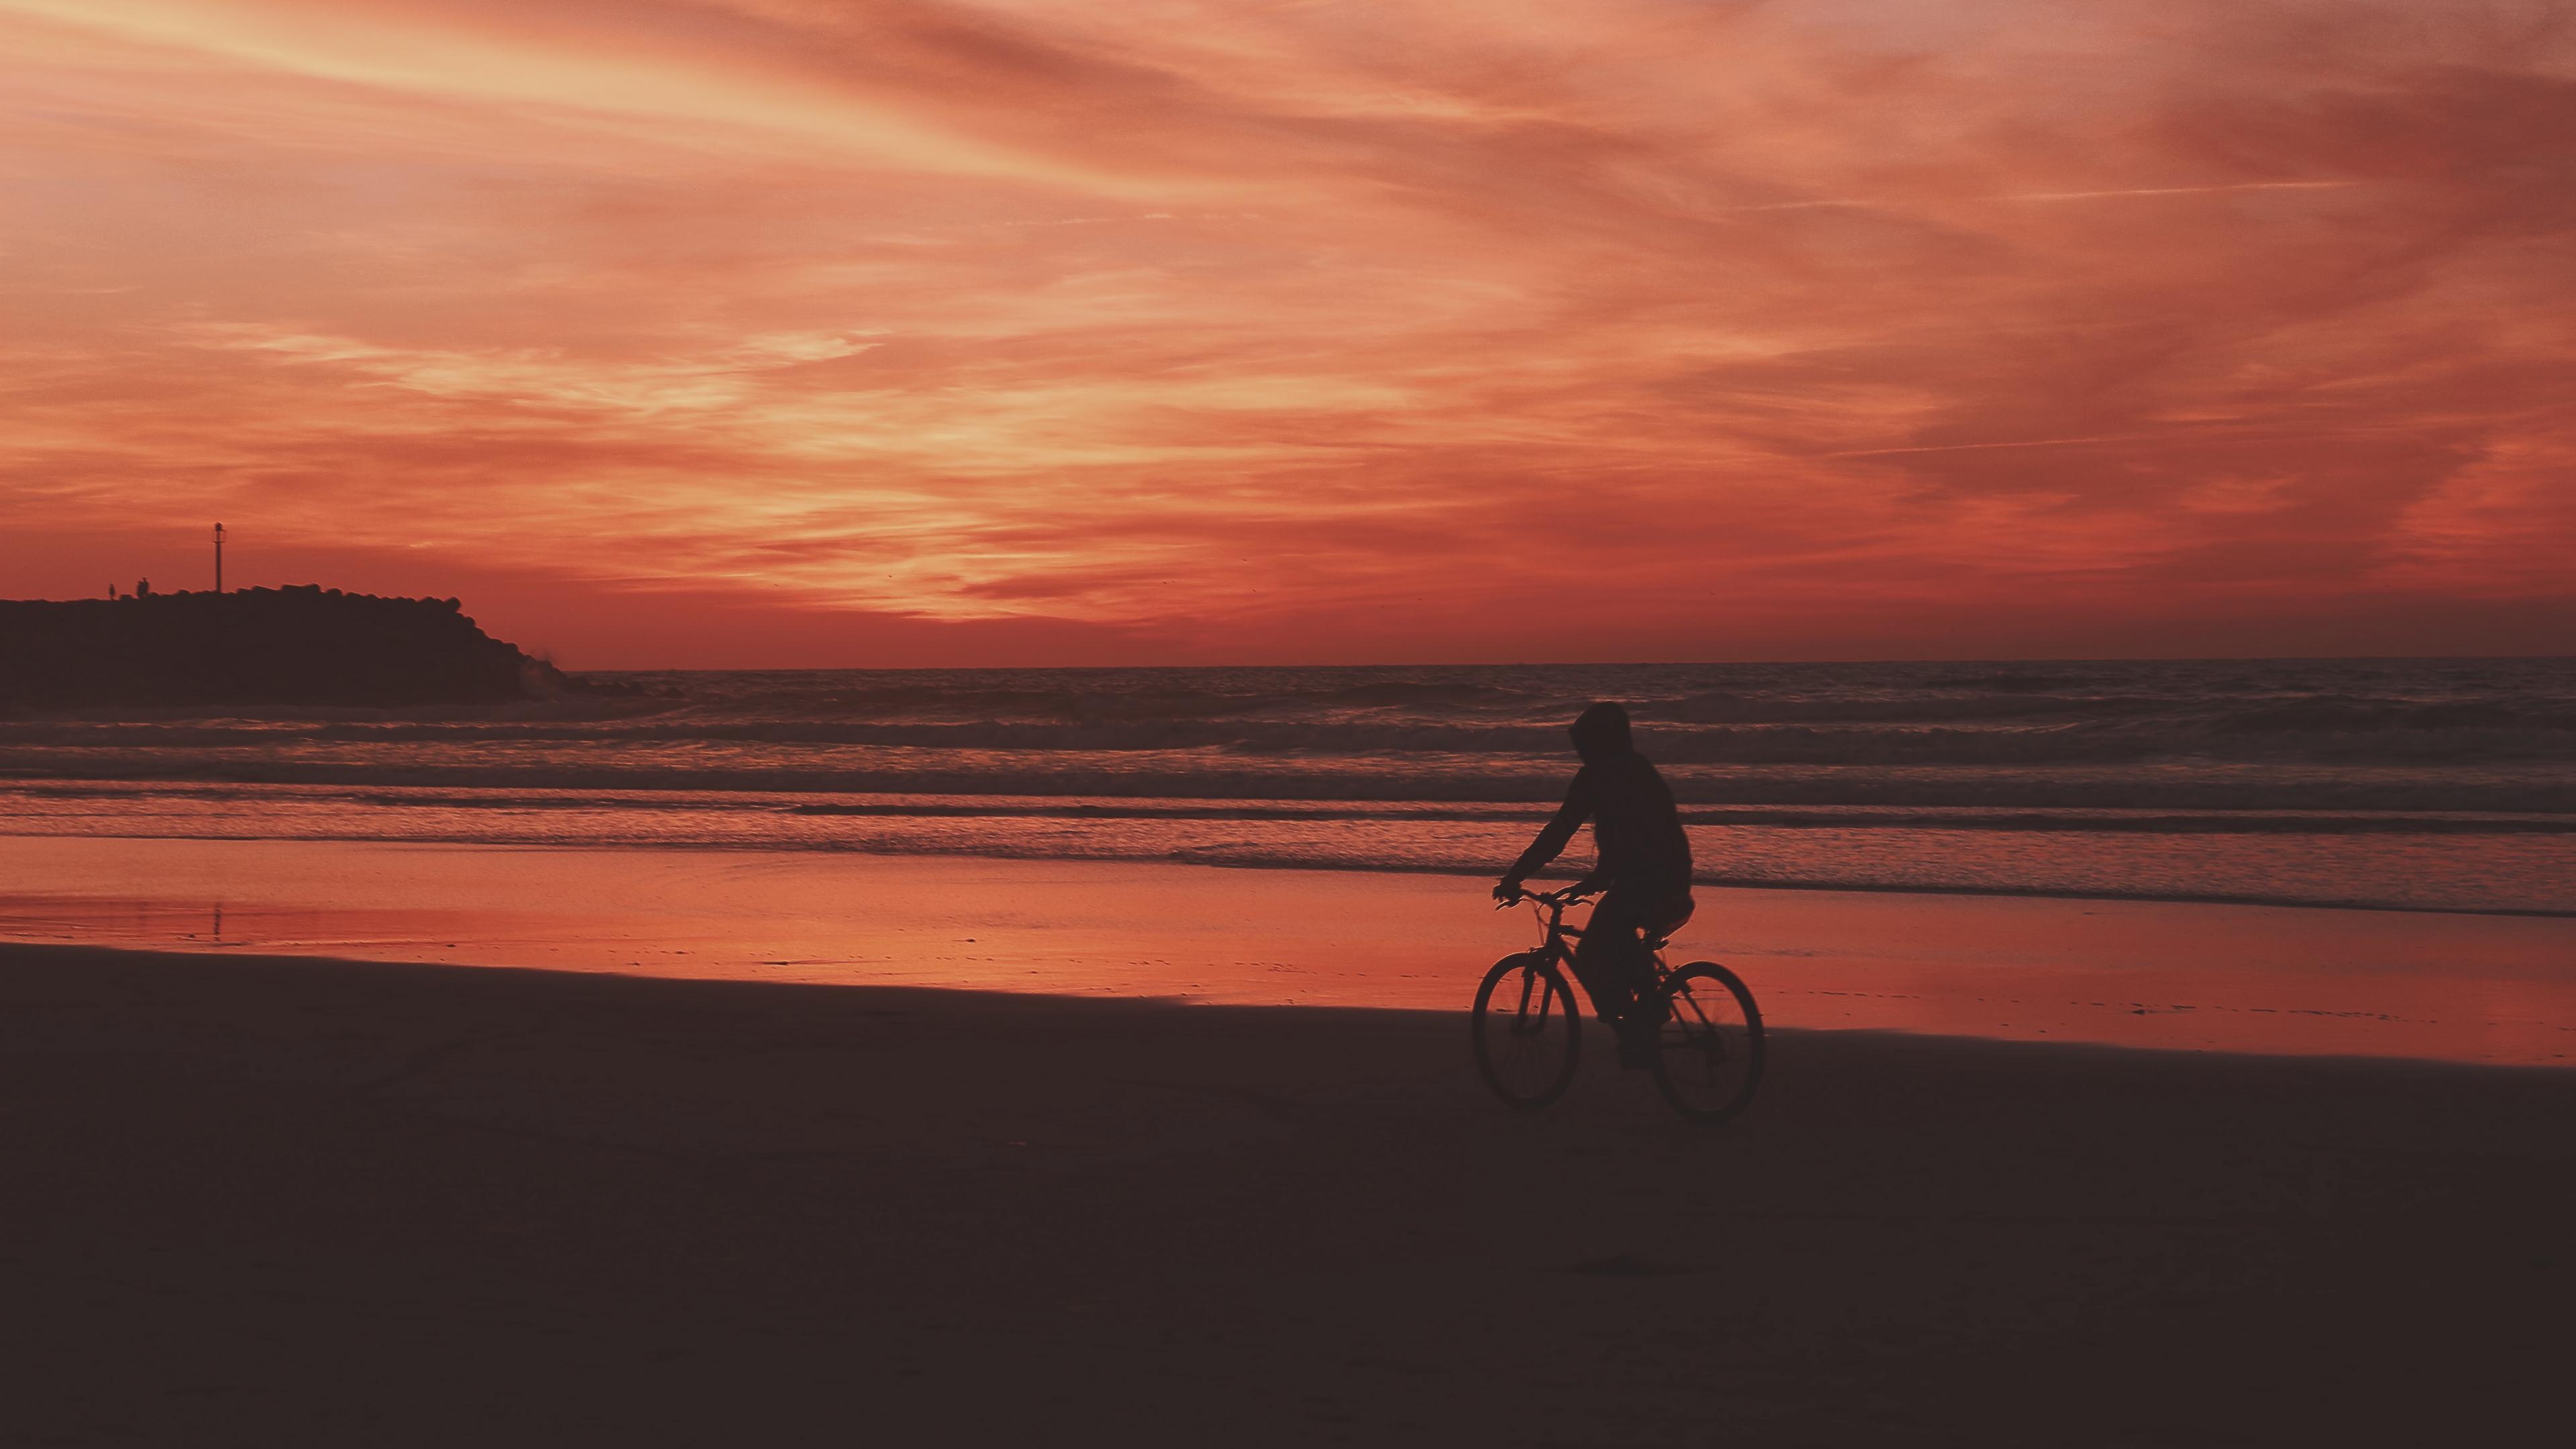 bicyclist sea shore sunset 4k 1540574500 - bicyclist, sea, shore, sunset 4k - Shore, Sea, bicyclist